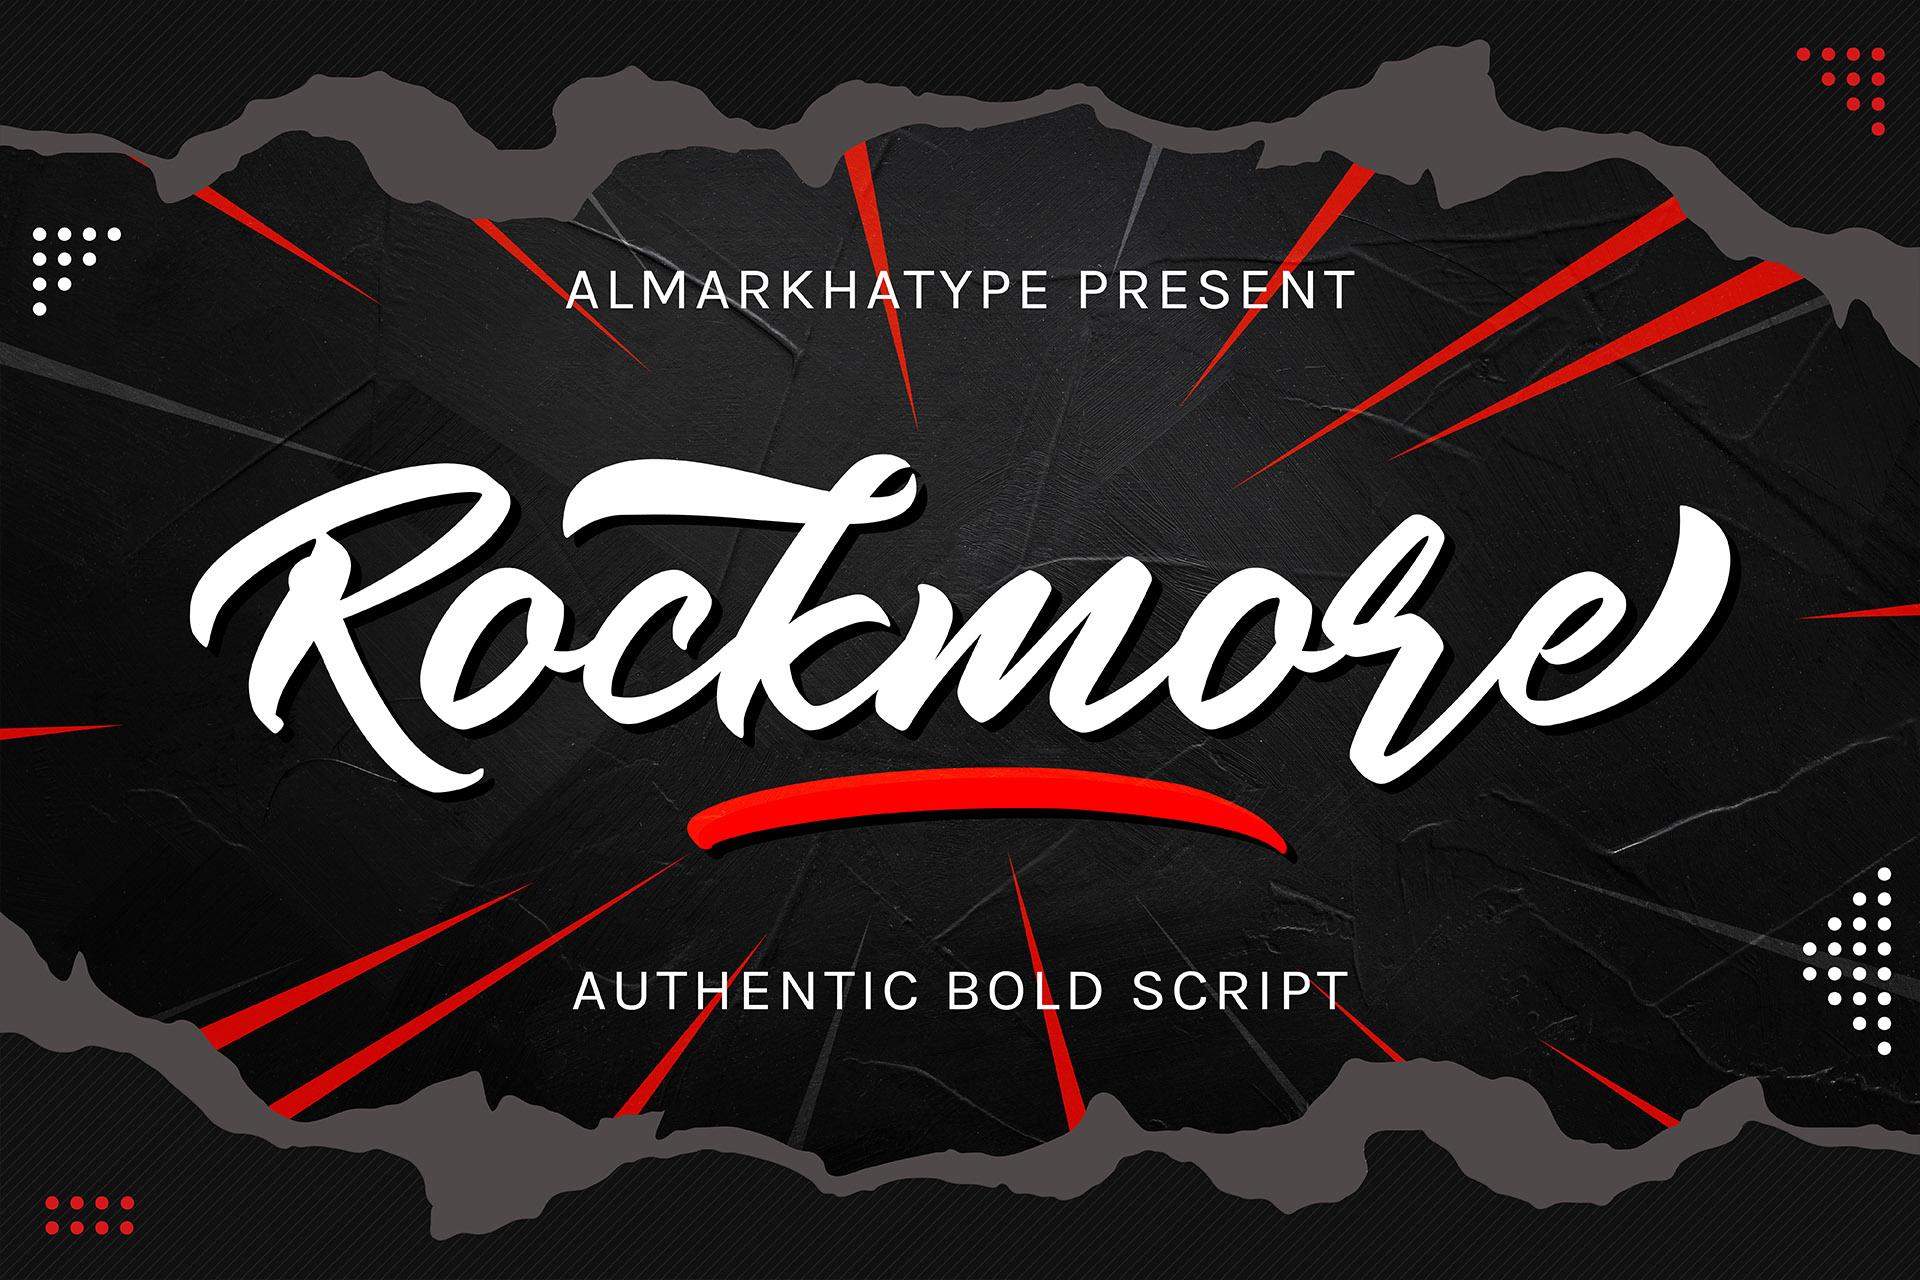 Rockmore - Authentic Bold Script example image 1